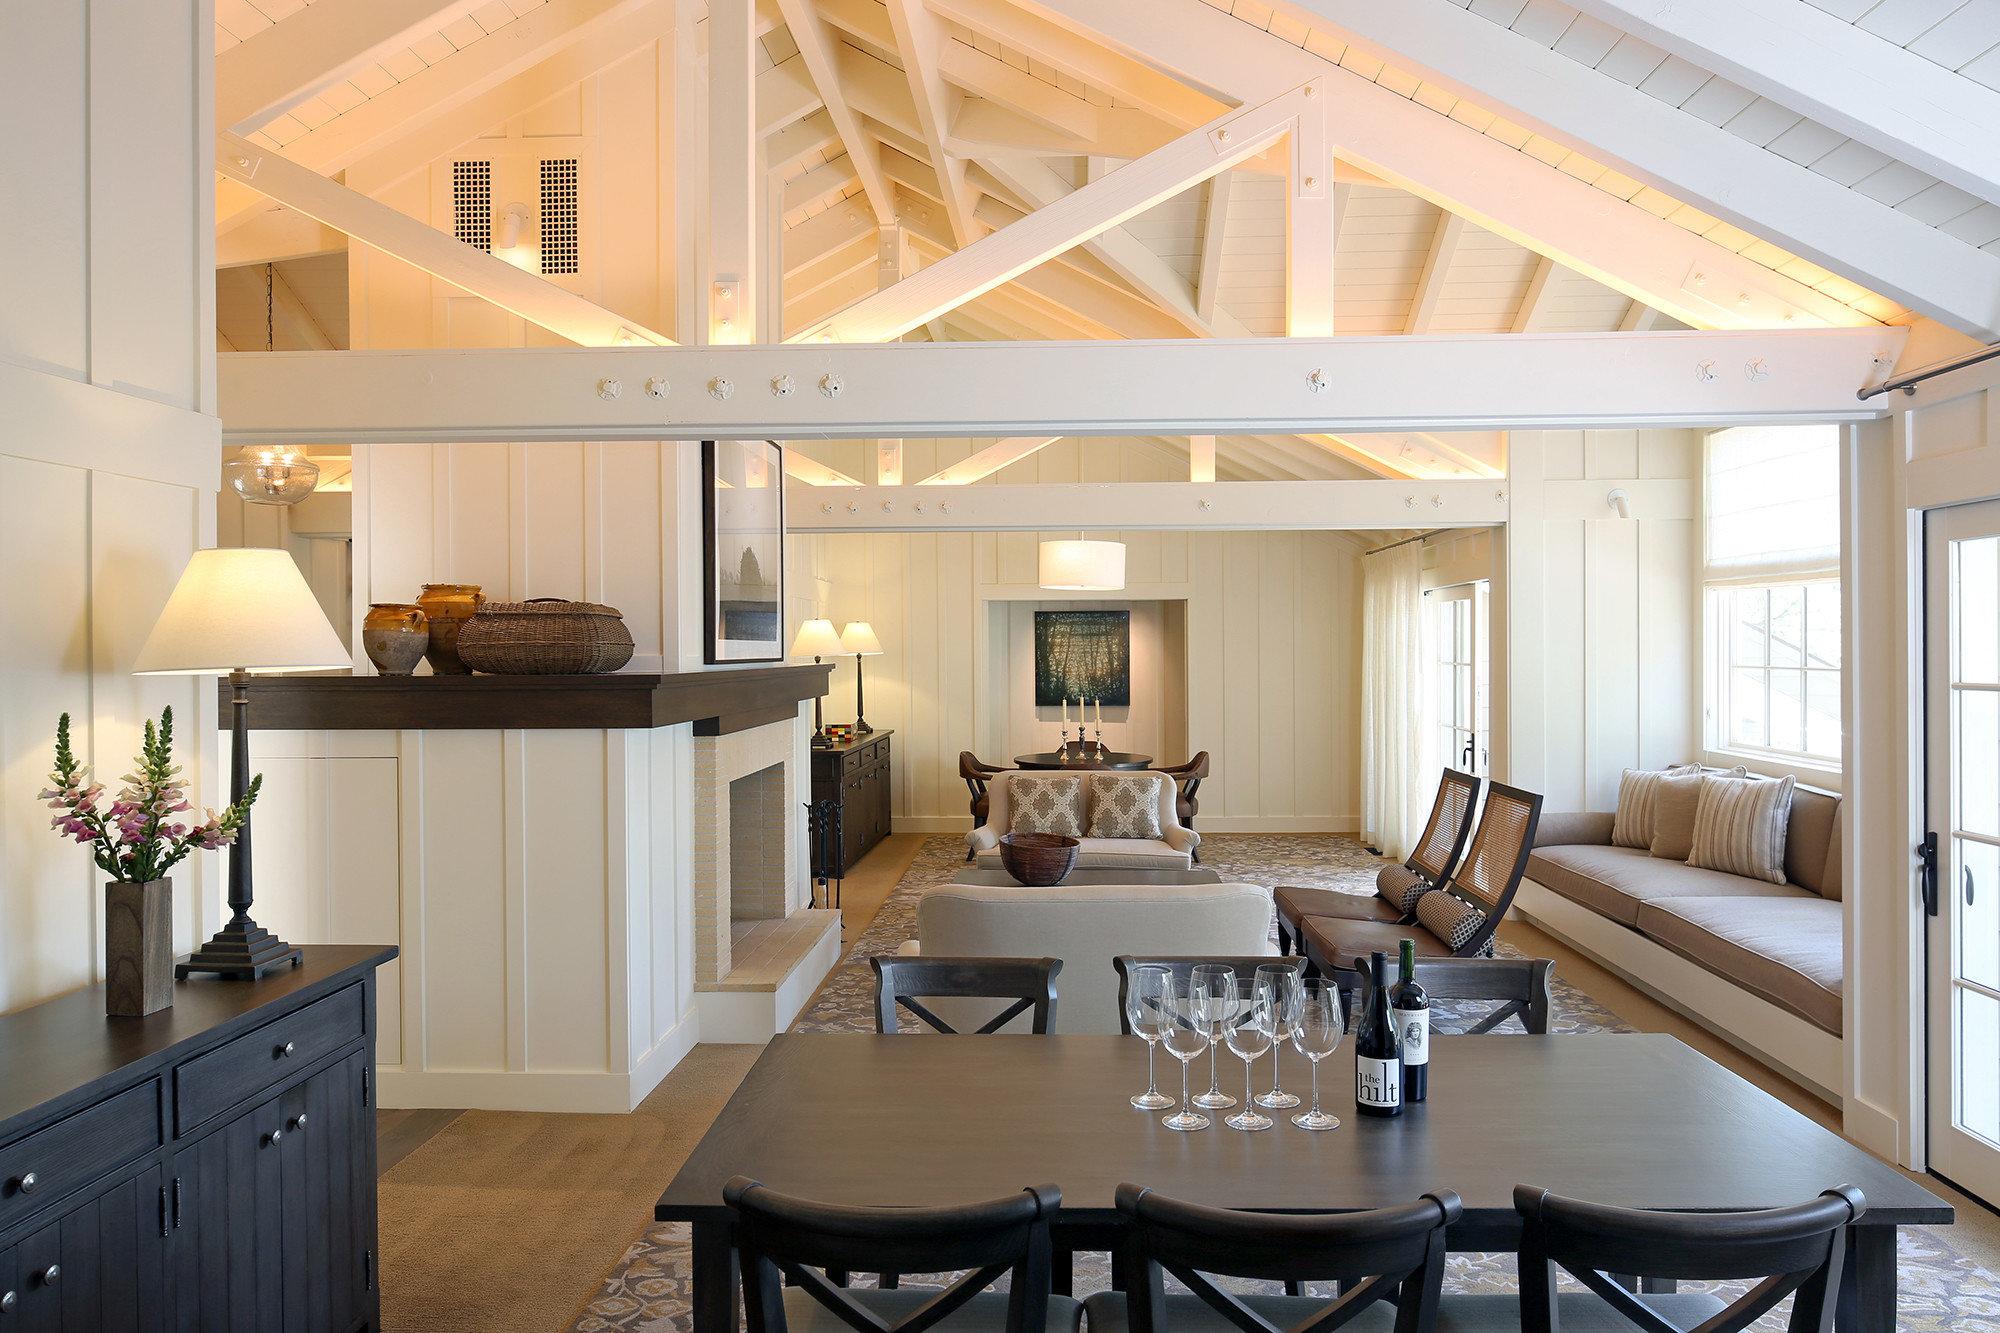 property living room home Kitchen daylighting penthouse apartment cuisine classique interior designer flooring hardwood